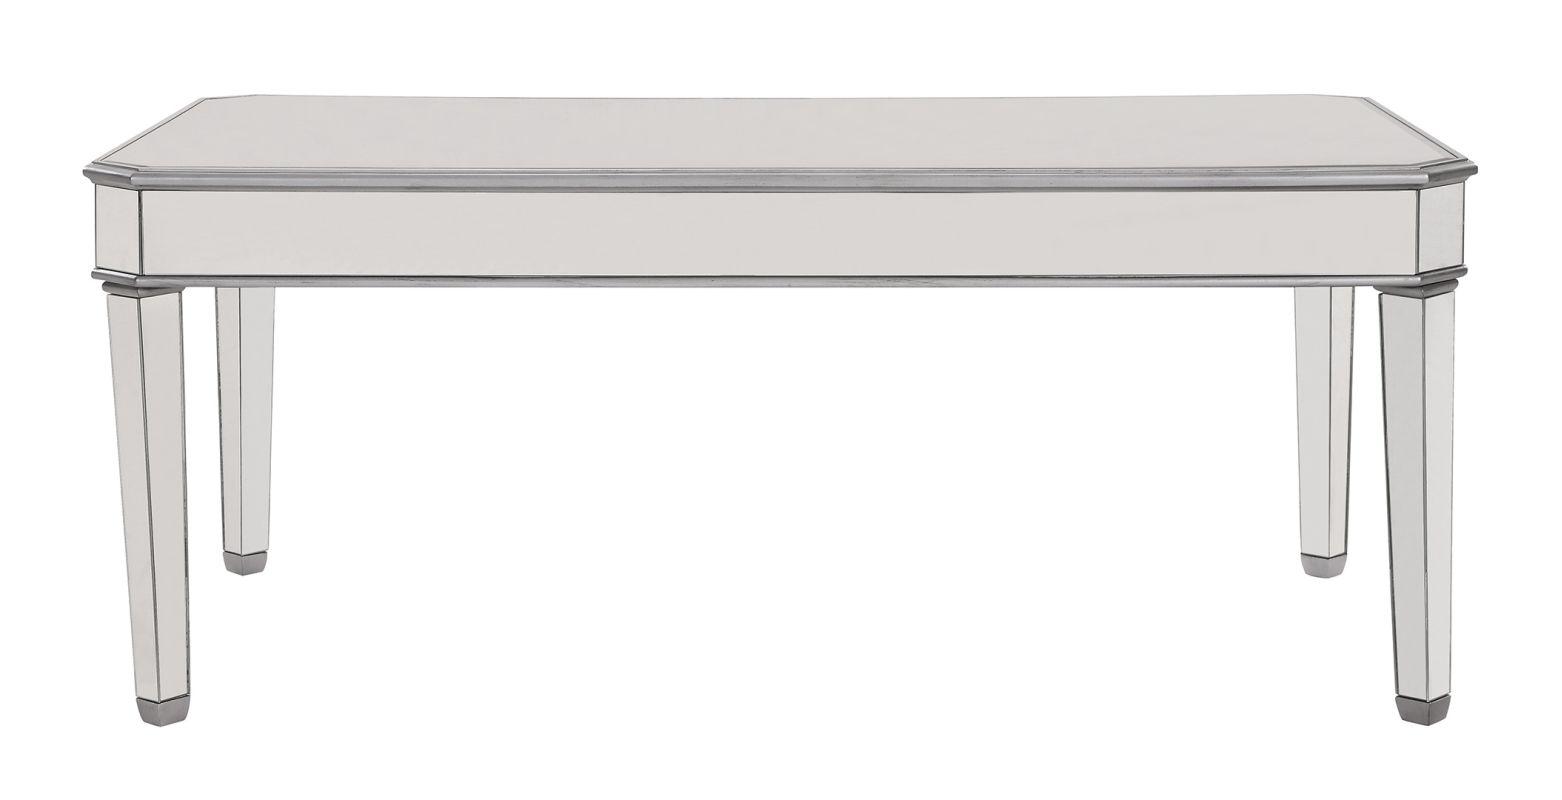 Elegant Lighting MF6-1009 Chamberlan 60 Inches Wide Hand Painted Wood